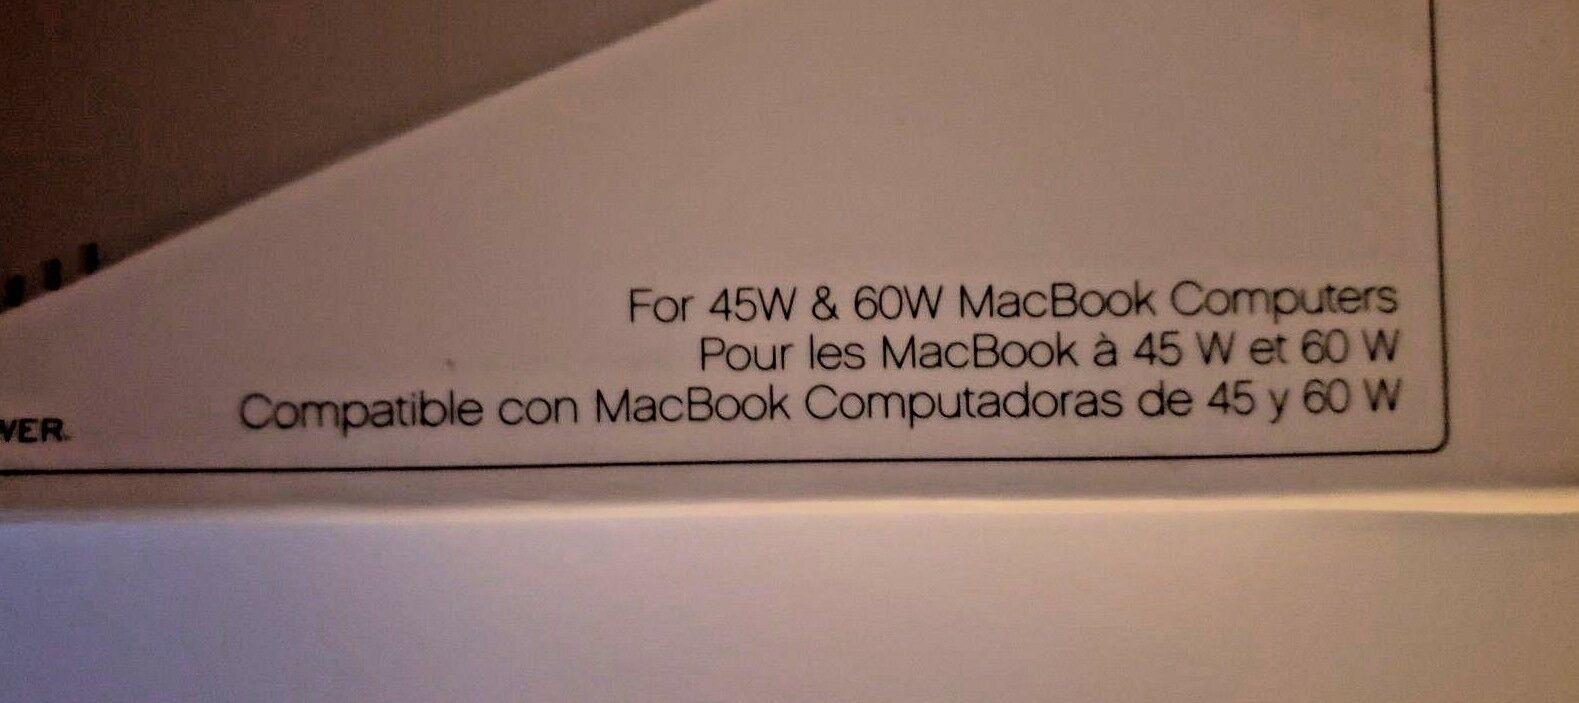 Lenmar Undead Power Chug Plug Apple Macbook Portable Power Charger PPWMB65 image 8